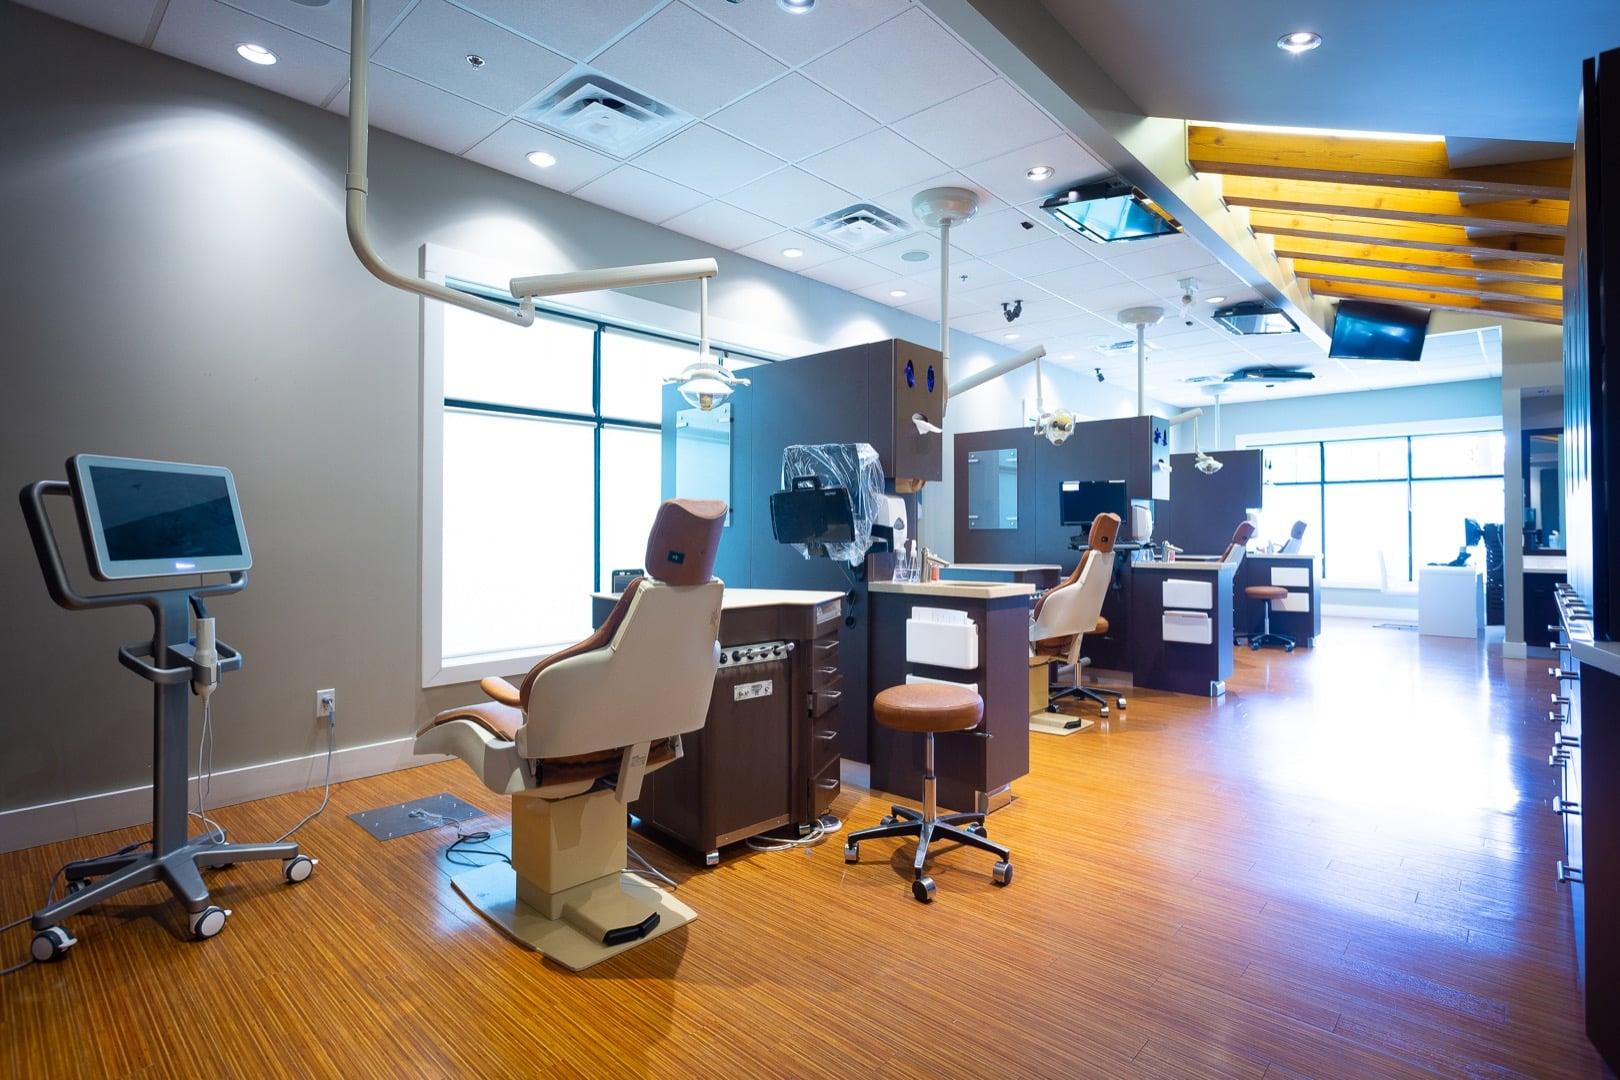 Office Interior Oceans Edge Orthodontics 2020 Nanaimo Canada Orthodontist 64 - Emergency Orthodontics